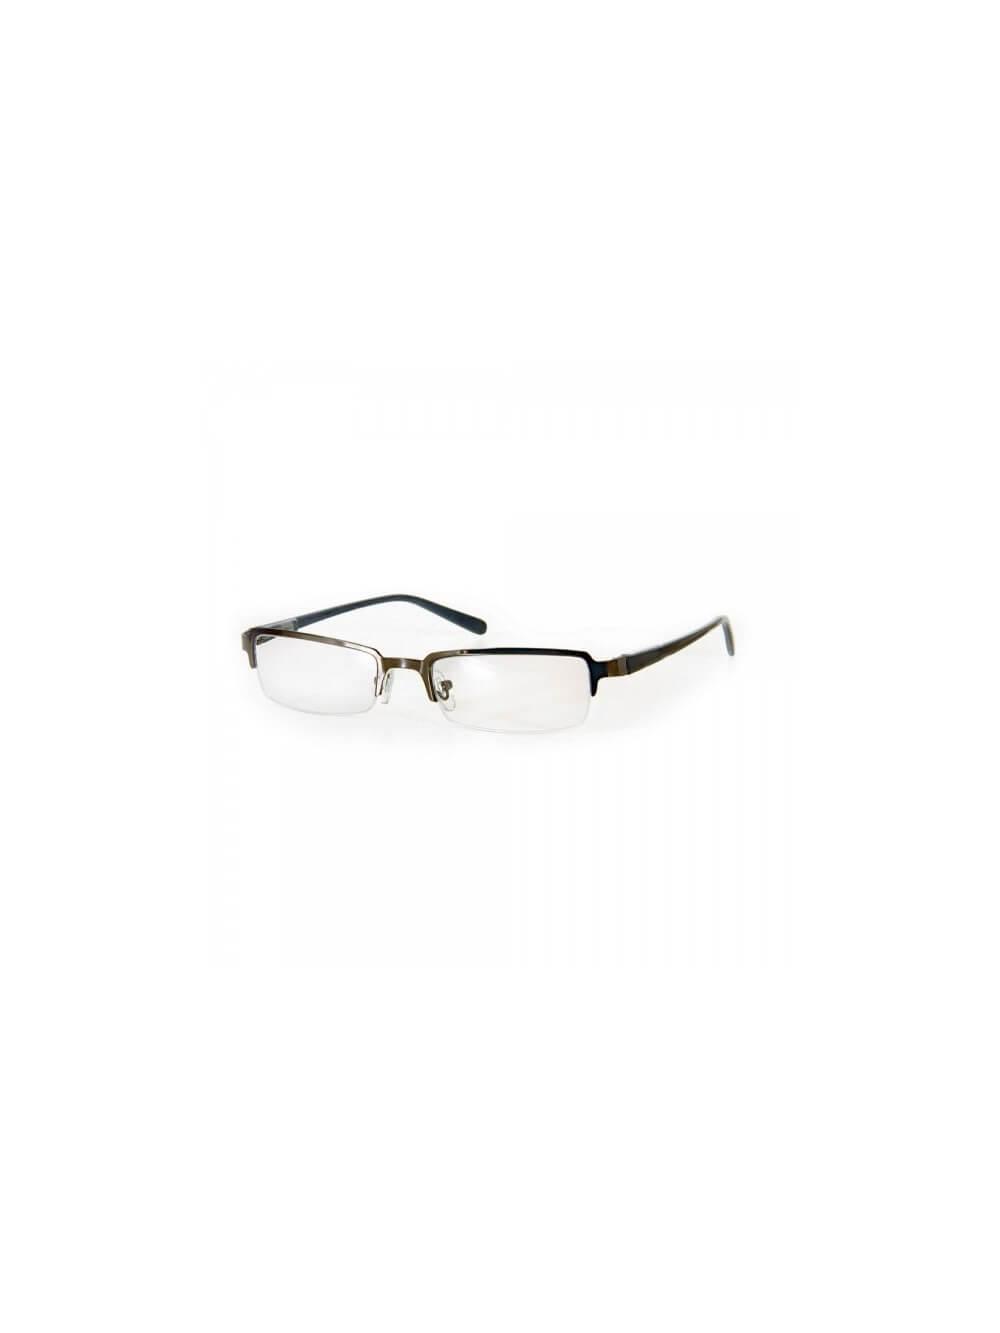 8e3db5517d Vitorgan EyeLead E106 Ανδρικά Γυαλιά Πρεσβυωπίας. Βαθμός 2.75 ...